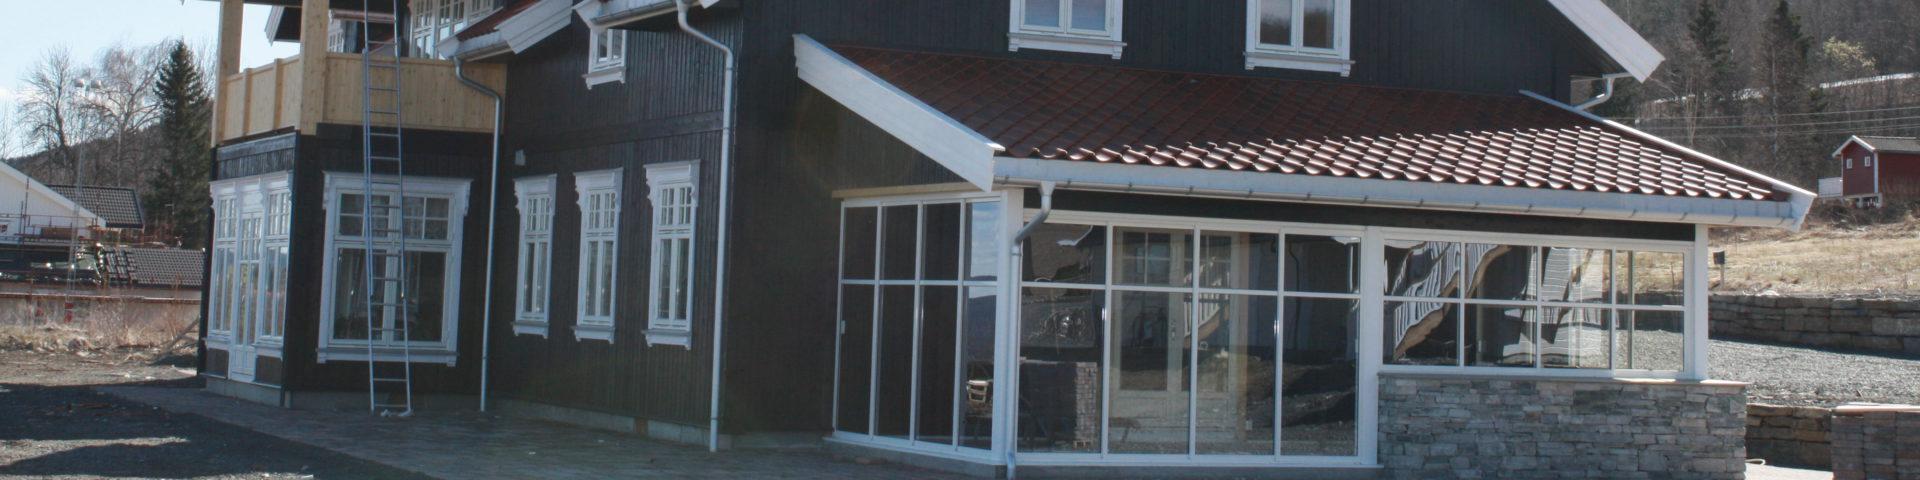 Bygg og Tømrermester Arild Østby AS